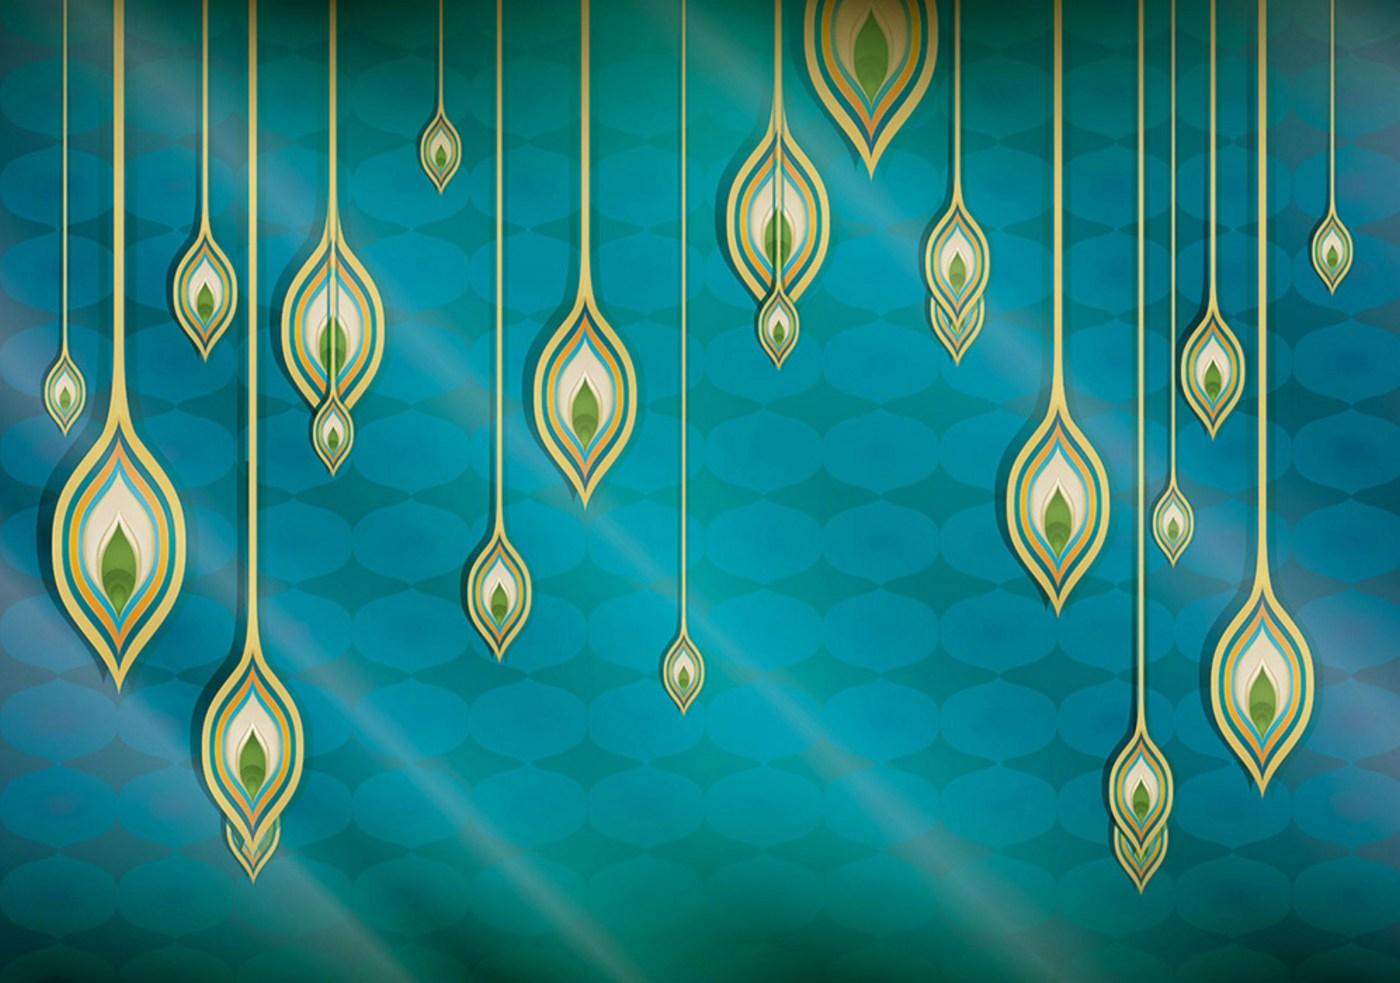 Orient Motif High Resolution Stock Photography